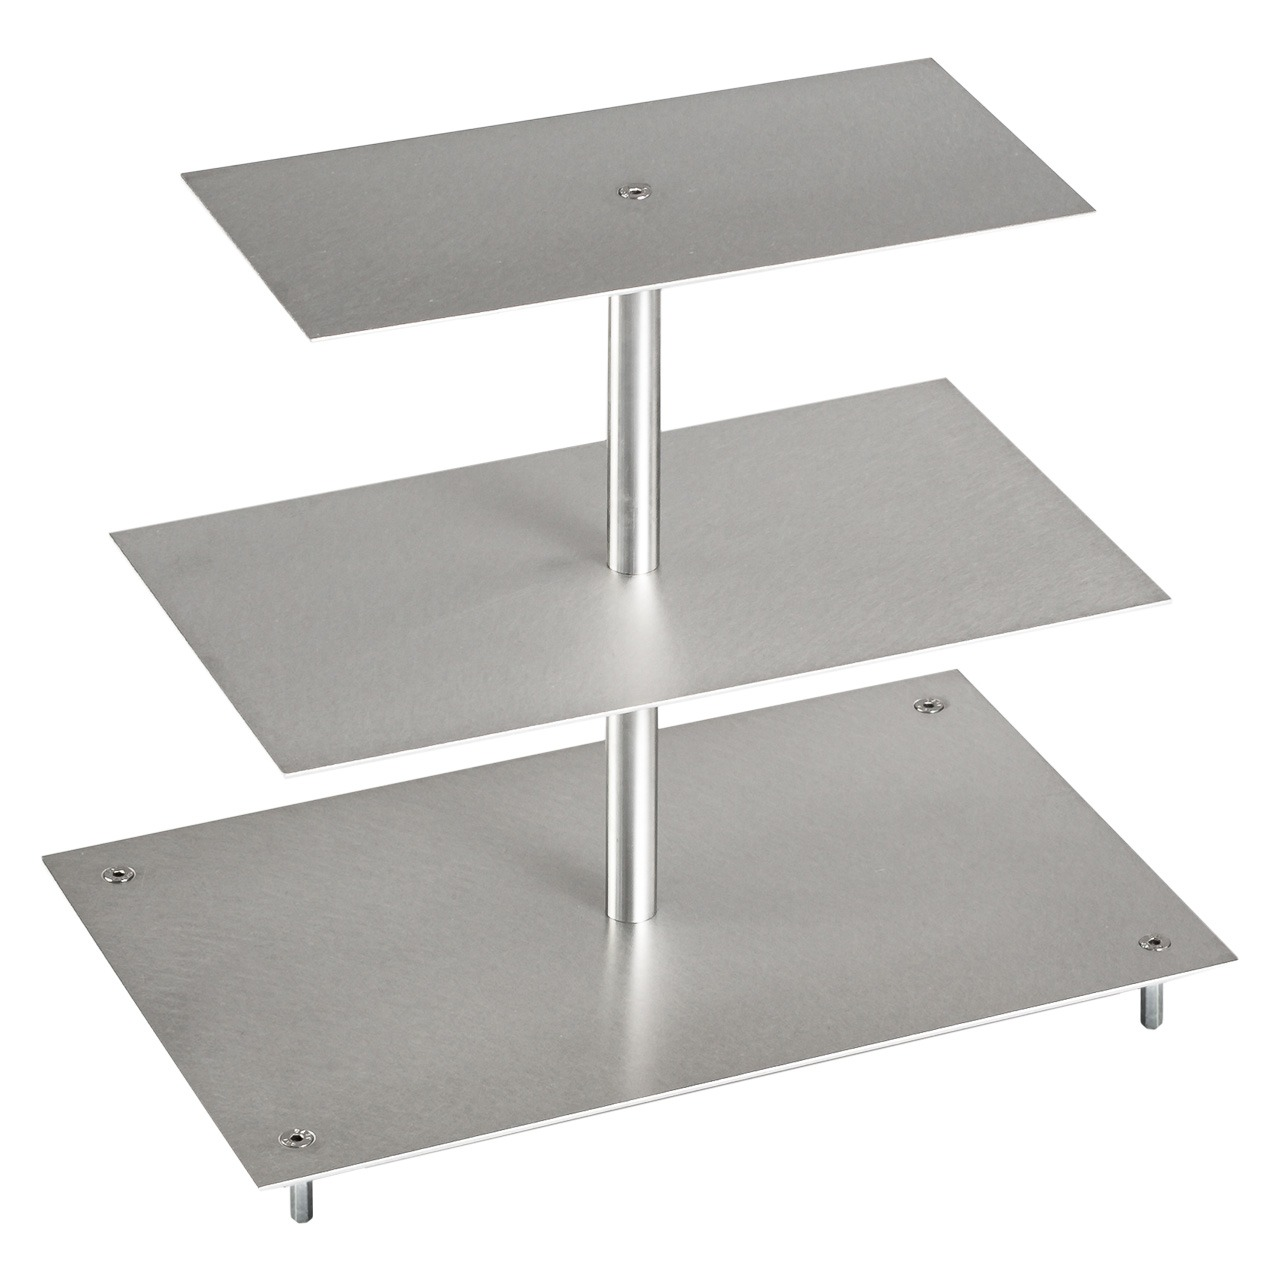 Tortenetagere, Aluminium, Rechteckig, 3-stöckig